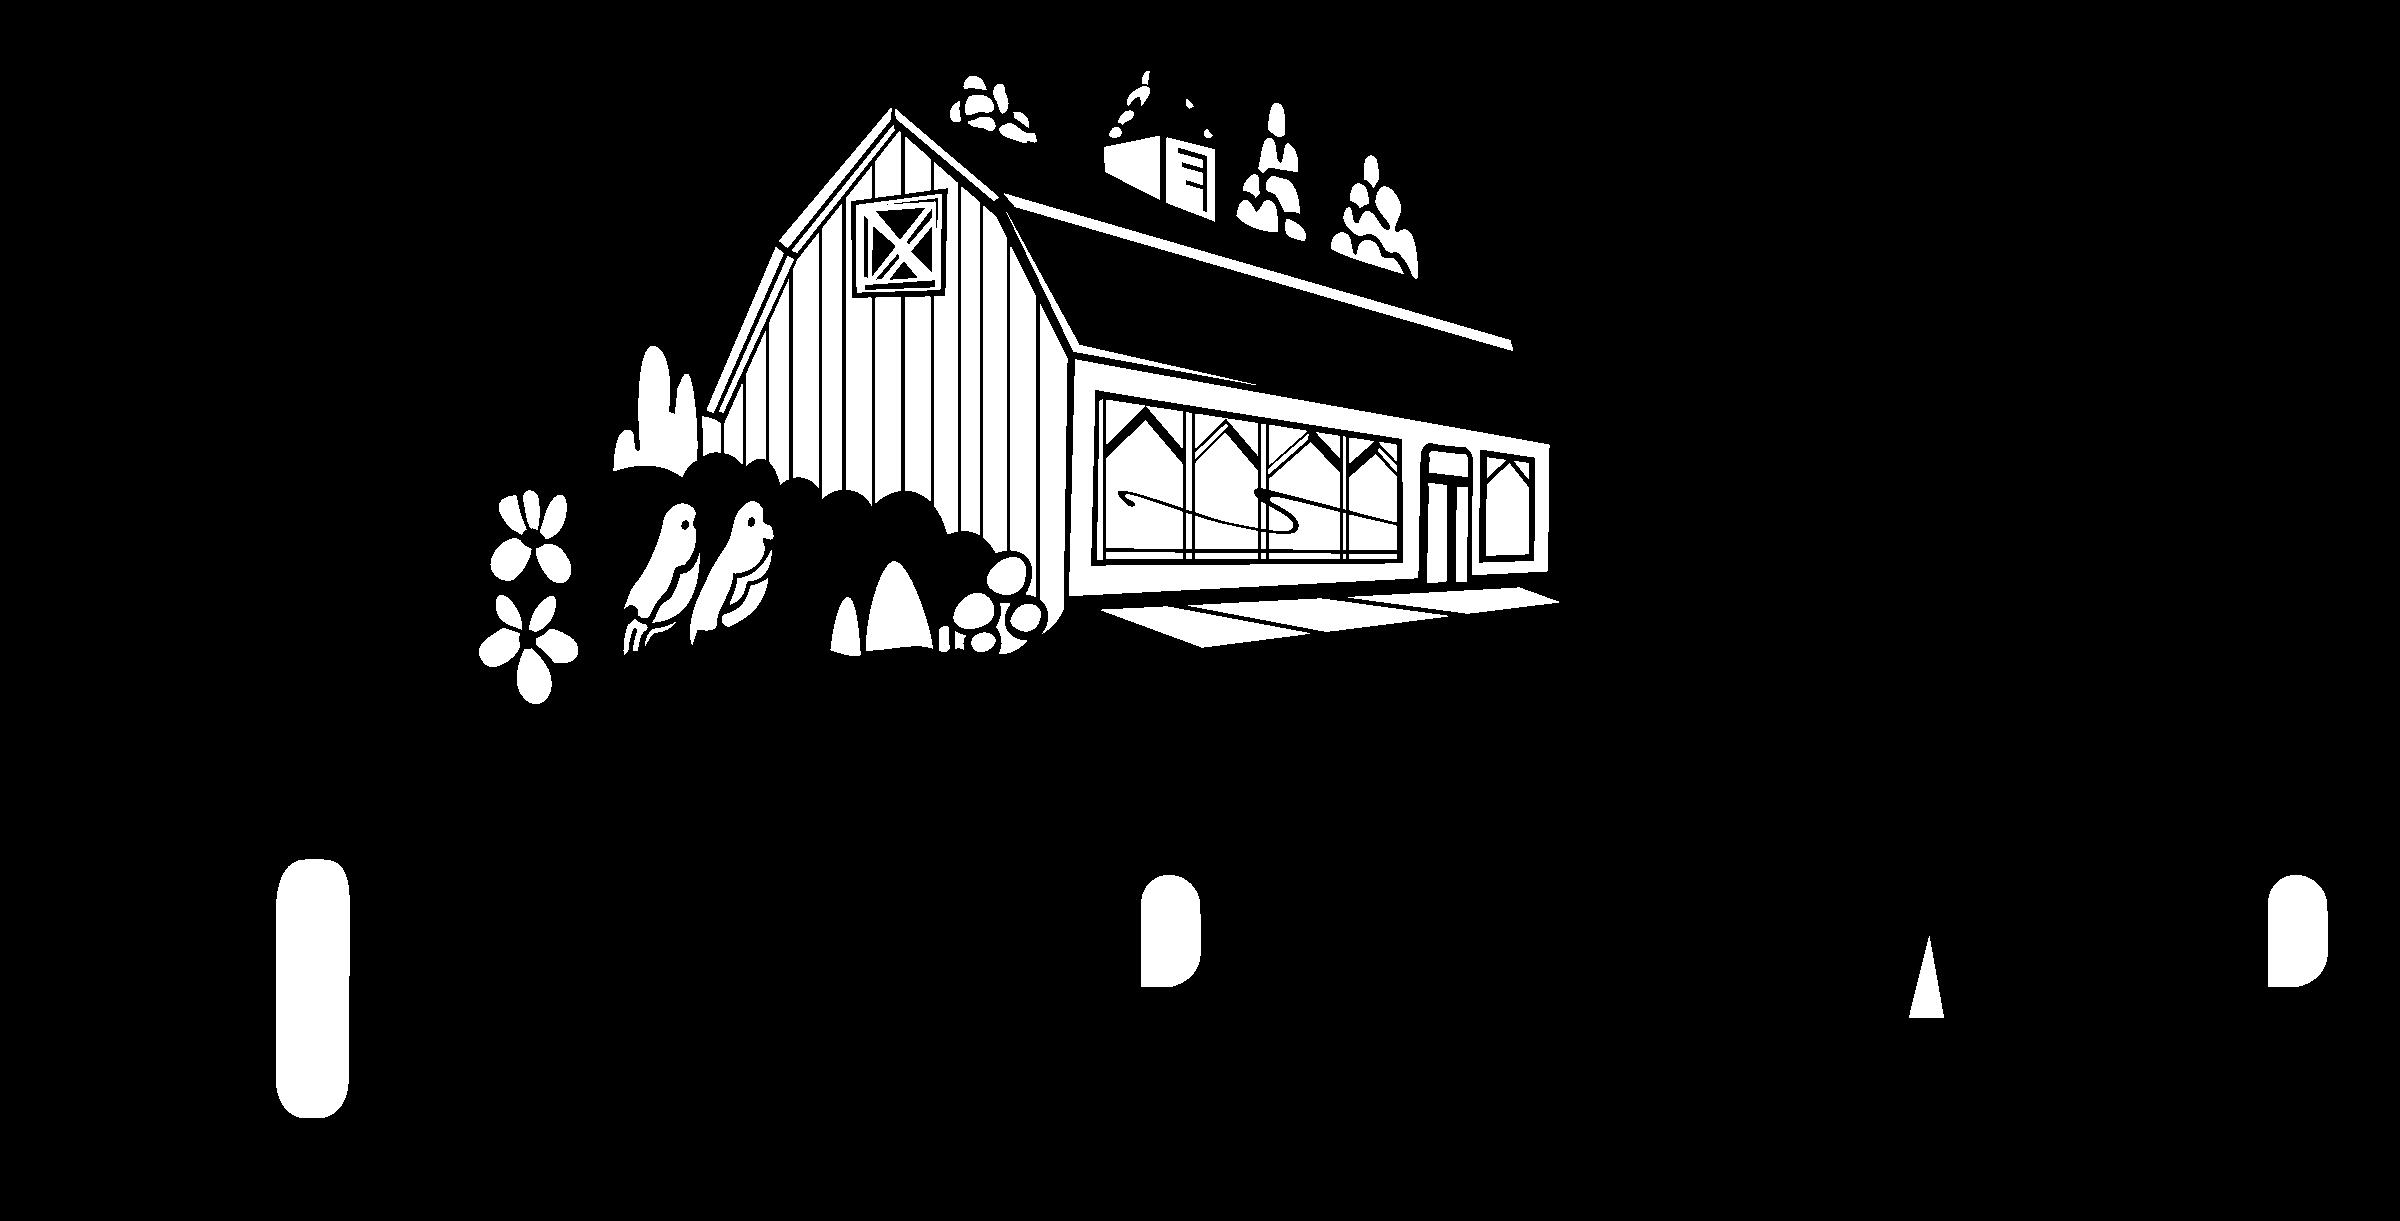 Country Fair Logo Black And White.